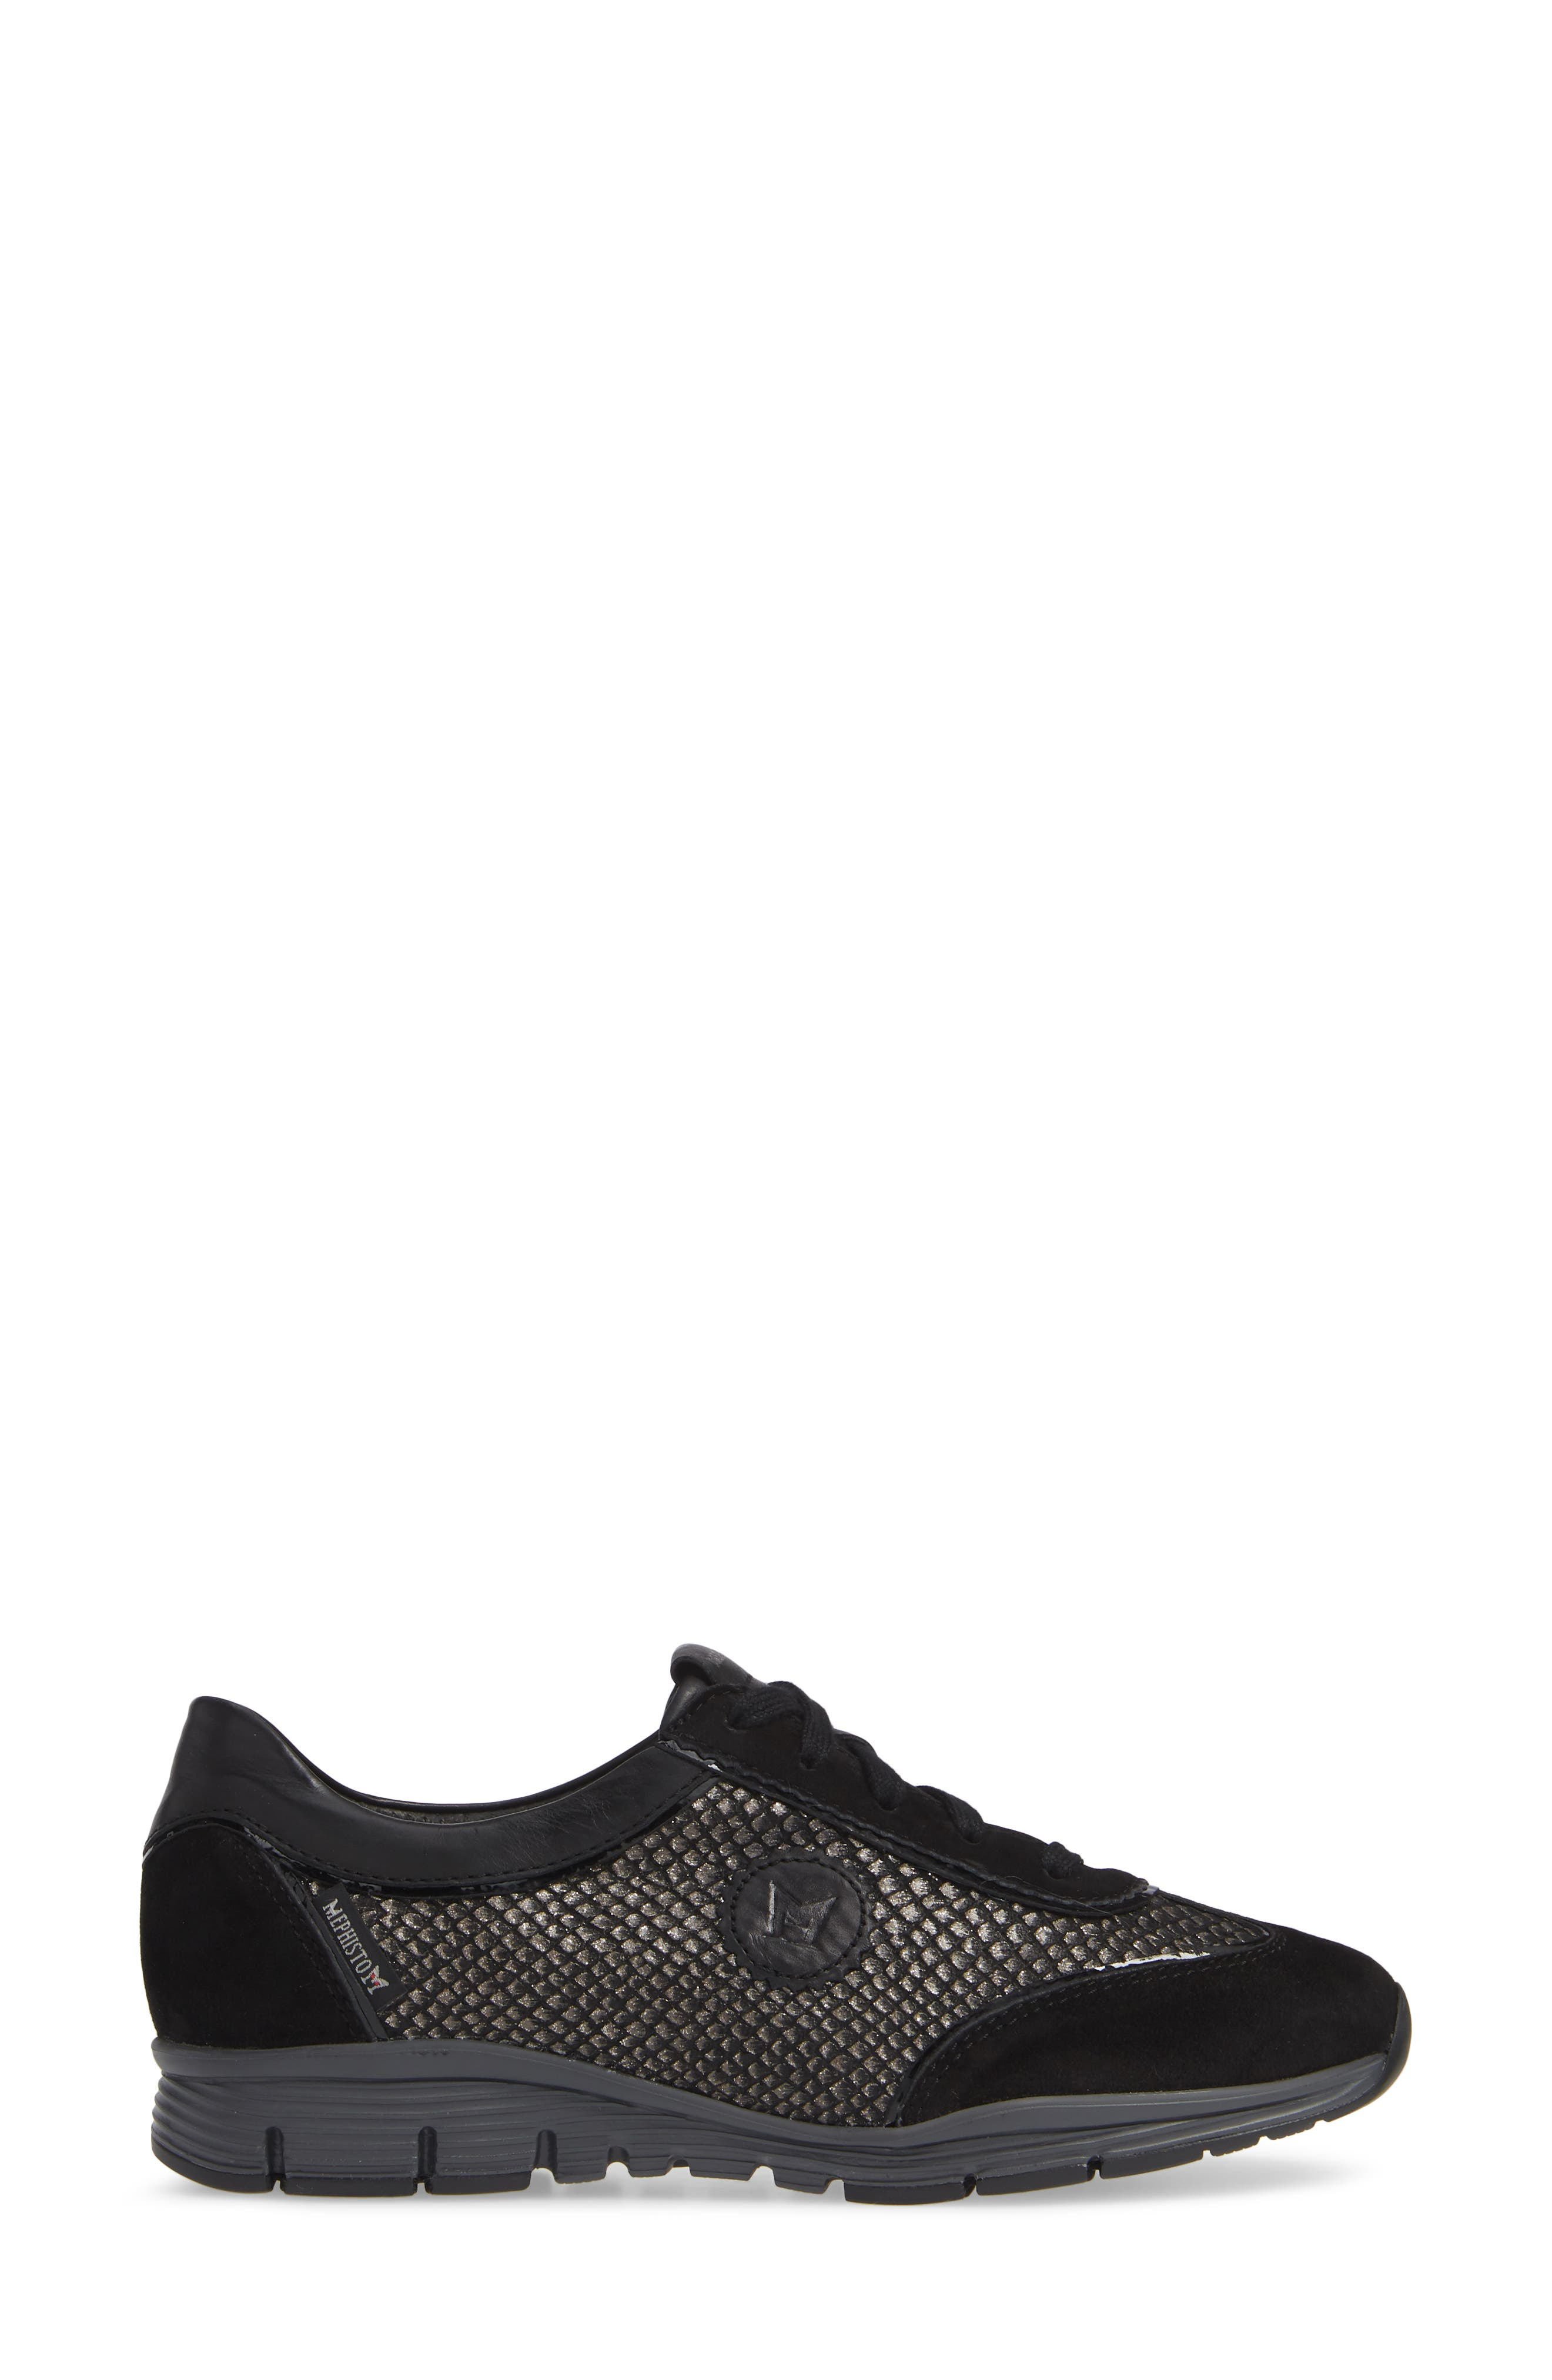 MEPHISTO, 'Yael' Soft-Air Sneaker, Alternate thumbnail 3, color, BLACK SUEDE